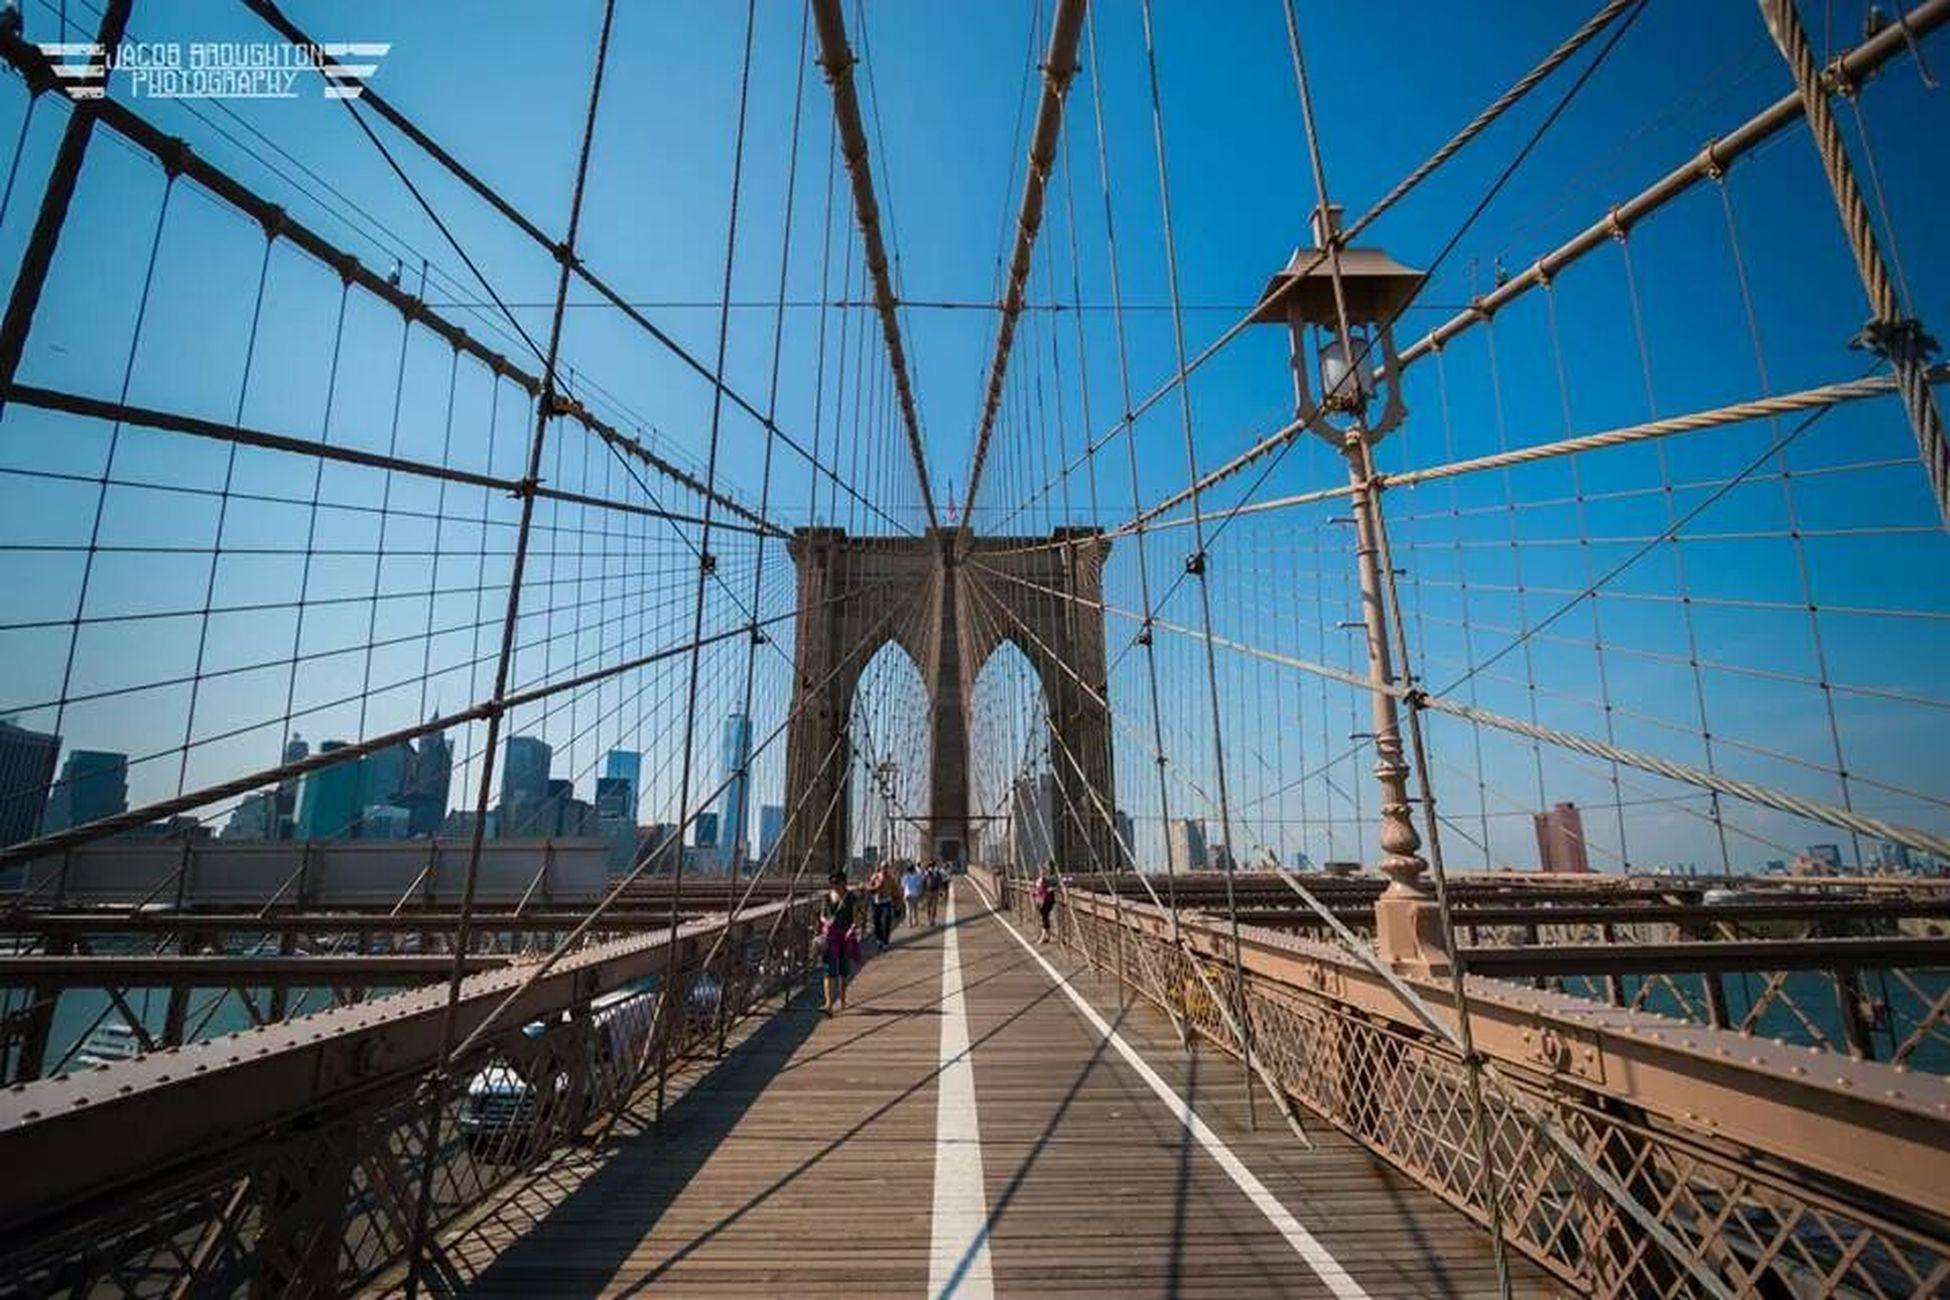 Pretty amazing, isnt it? Brooklynbridge JacobBroughtonPhotography